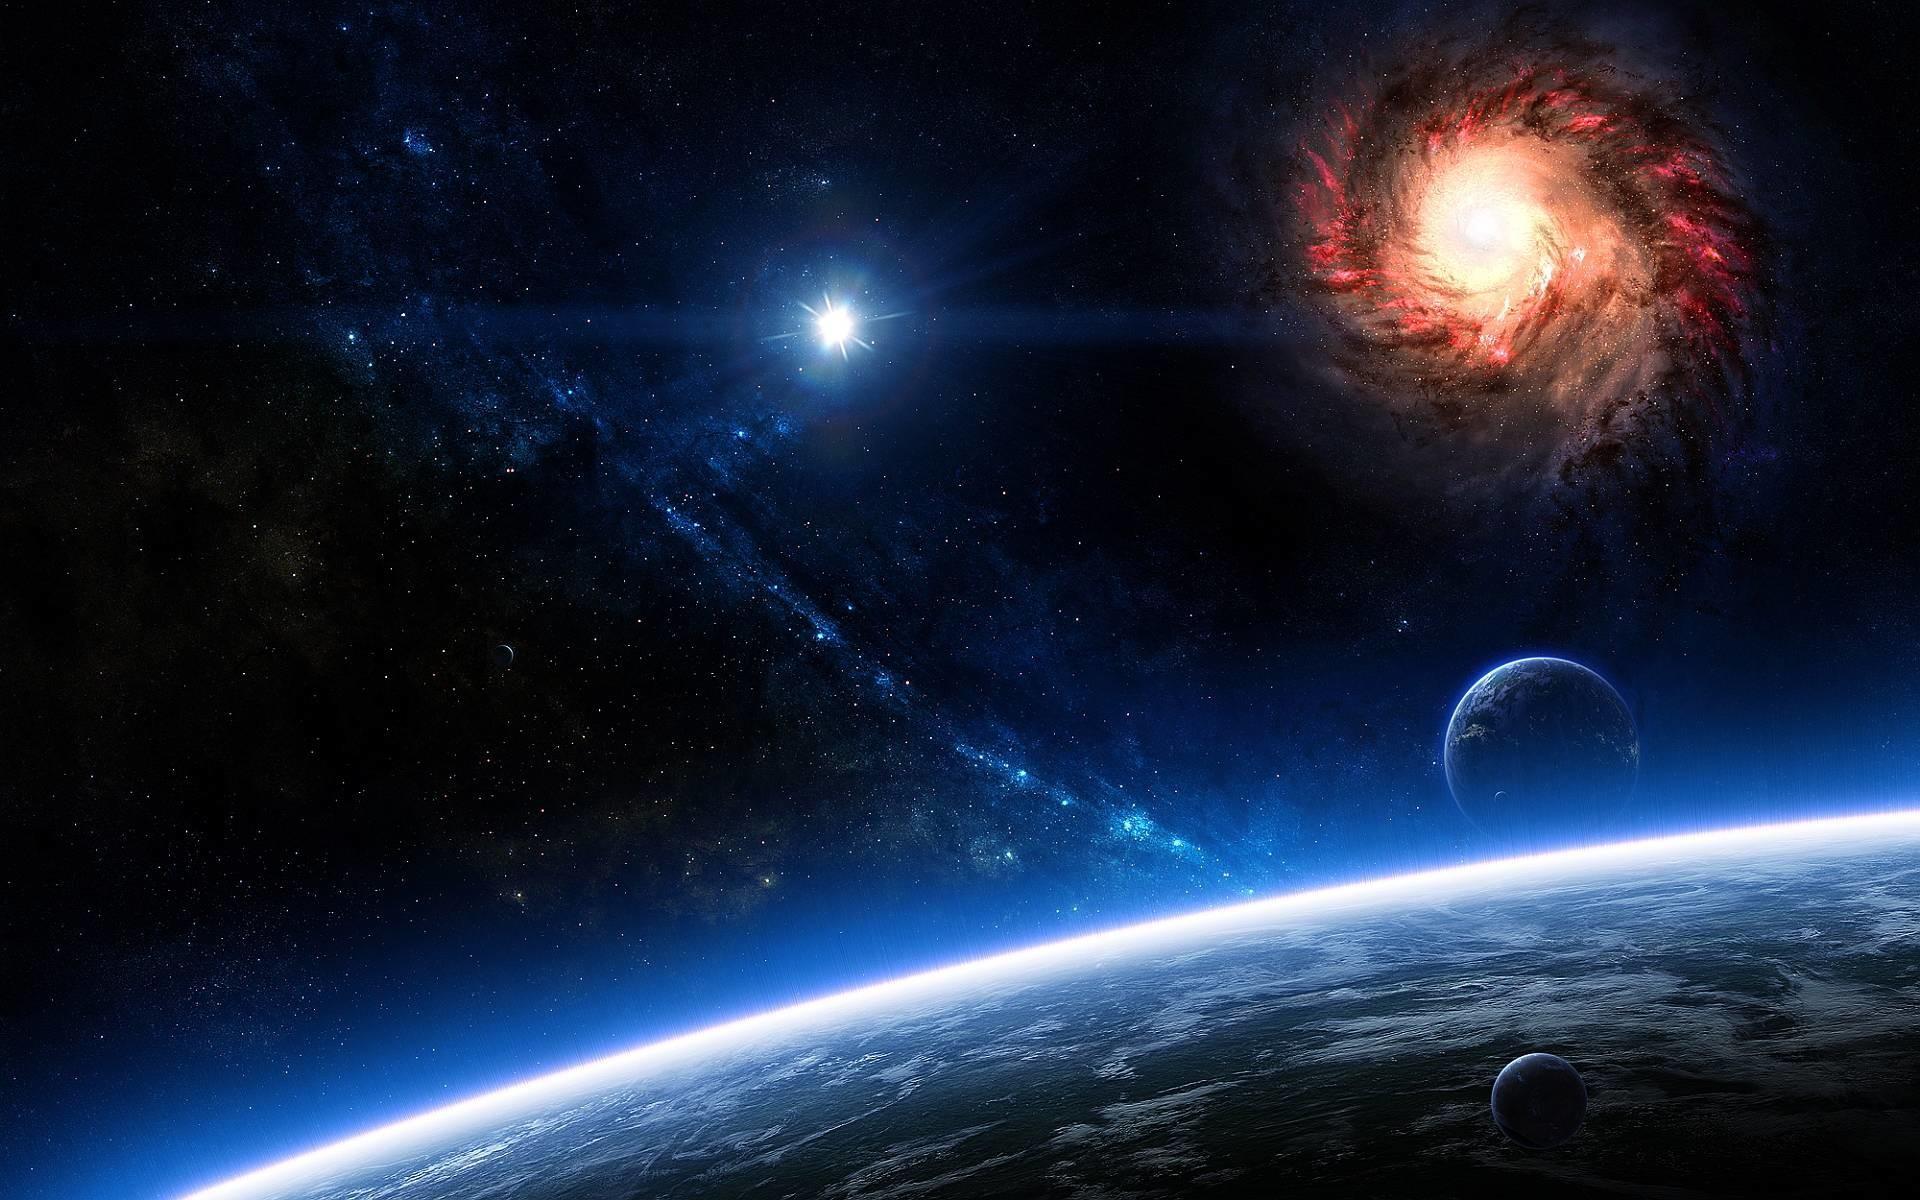 Space Planet Wallpaper – 706167